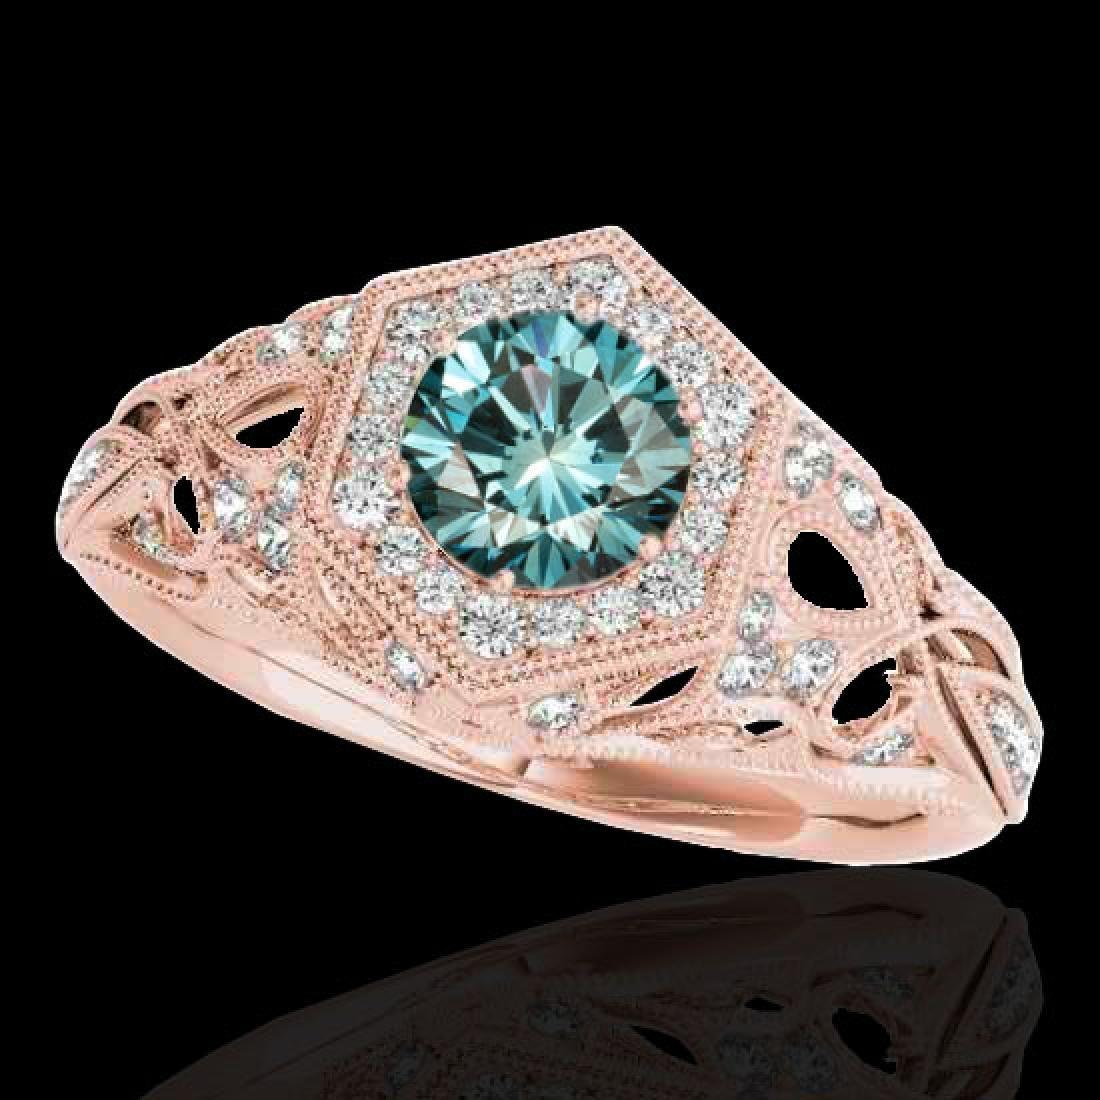 1.4 CTW SI Certified Fancy Blue Diamond Solitaire